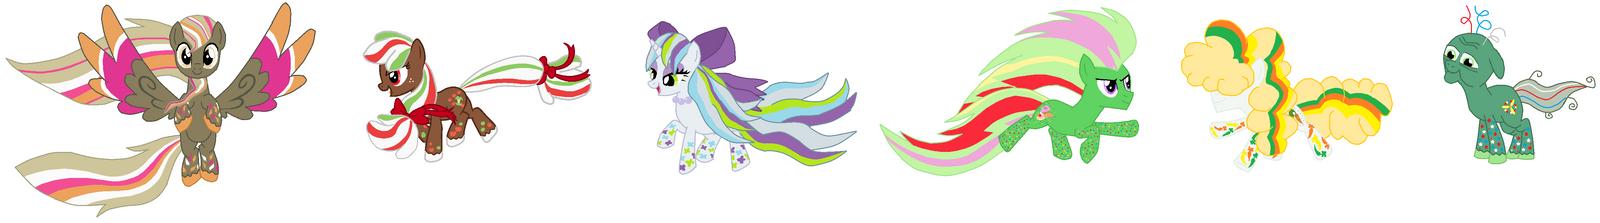 Mane 6 Pets Rainbow Power by FreshlyBaked2014 on DeviantArt